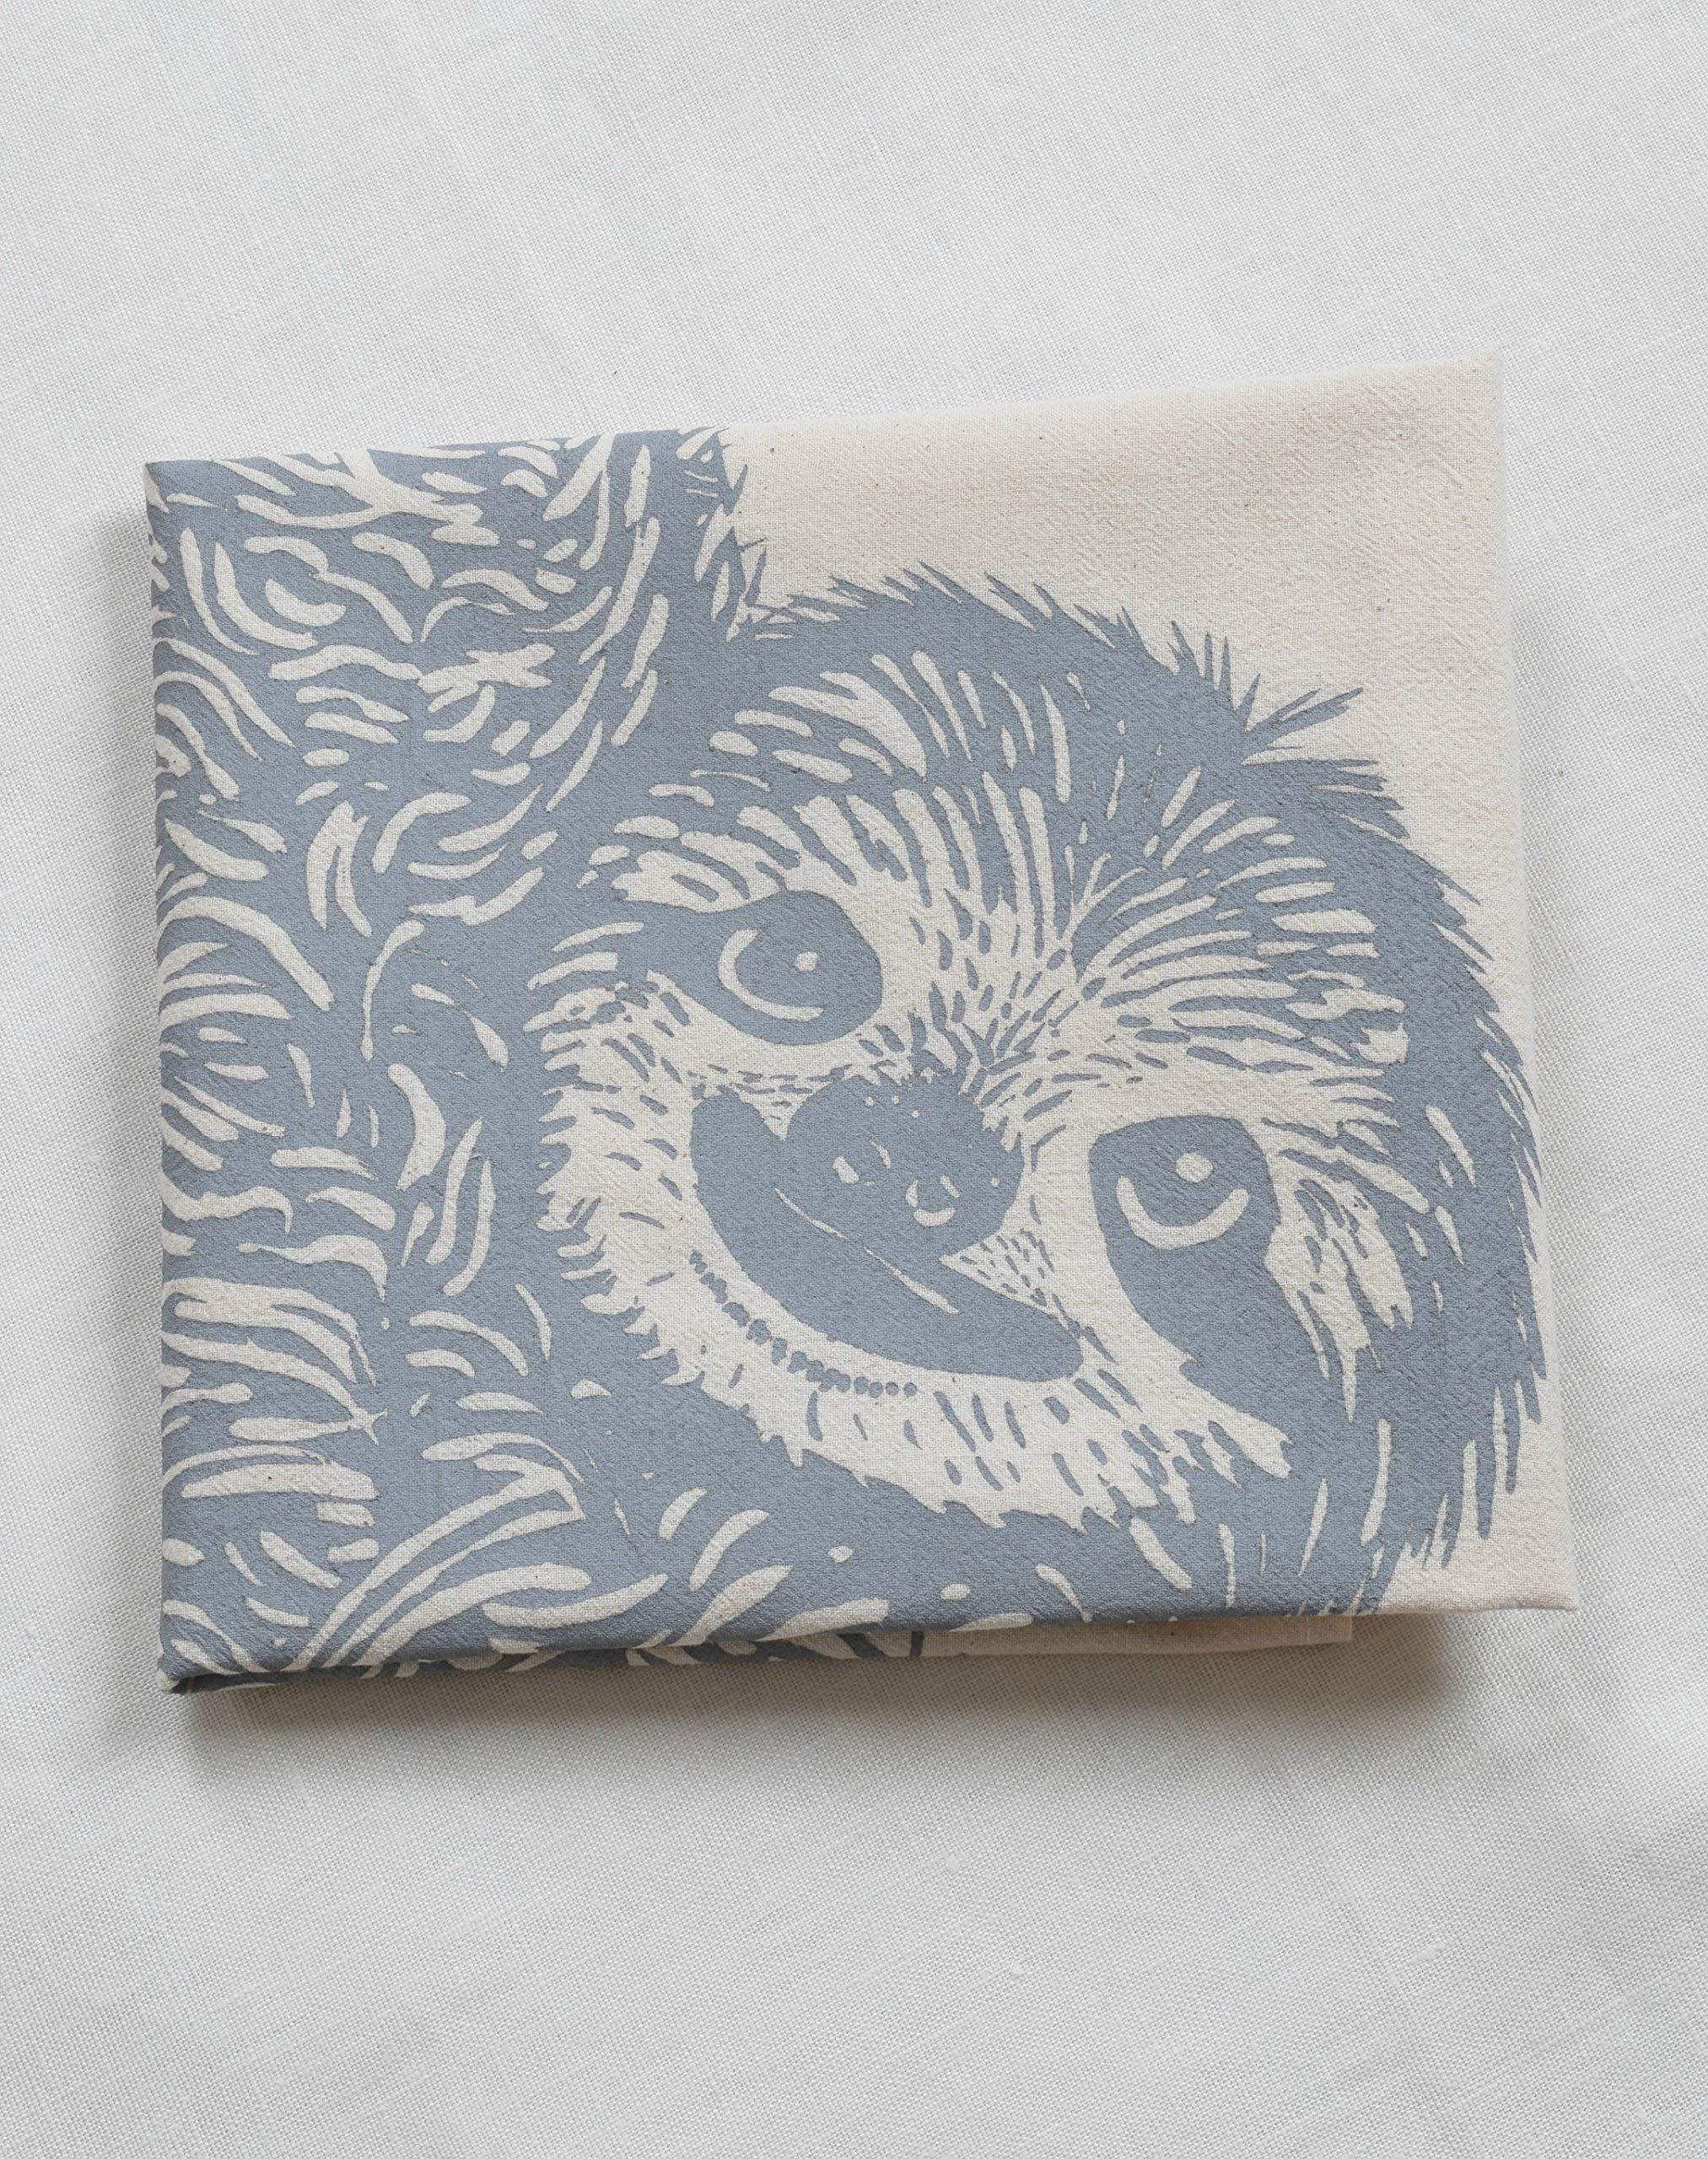 Tea Towel - Sloth Design in Grey - Organic Flour Sack Cotton